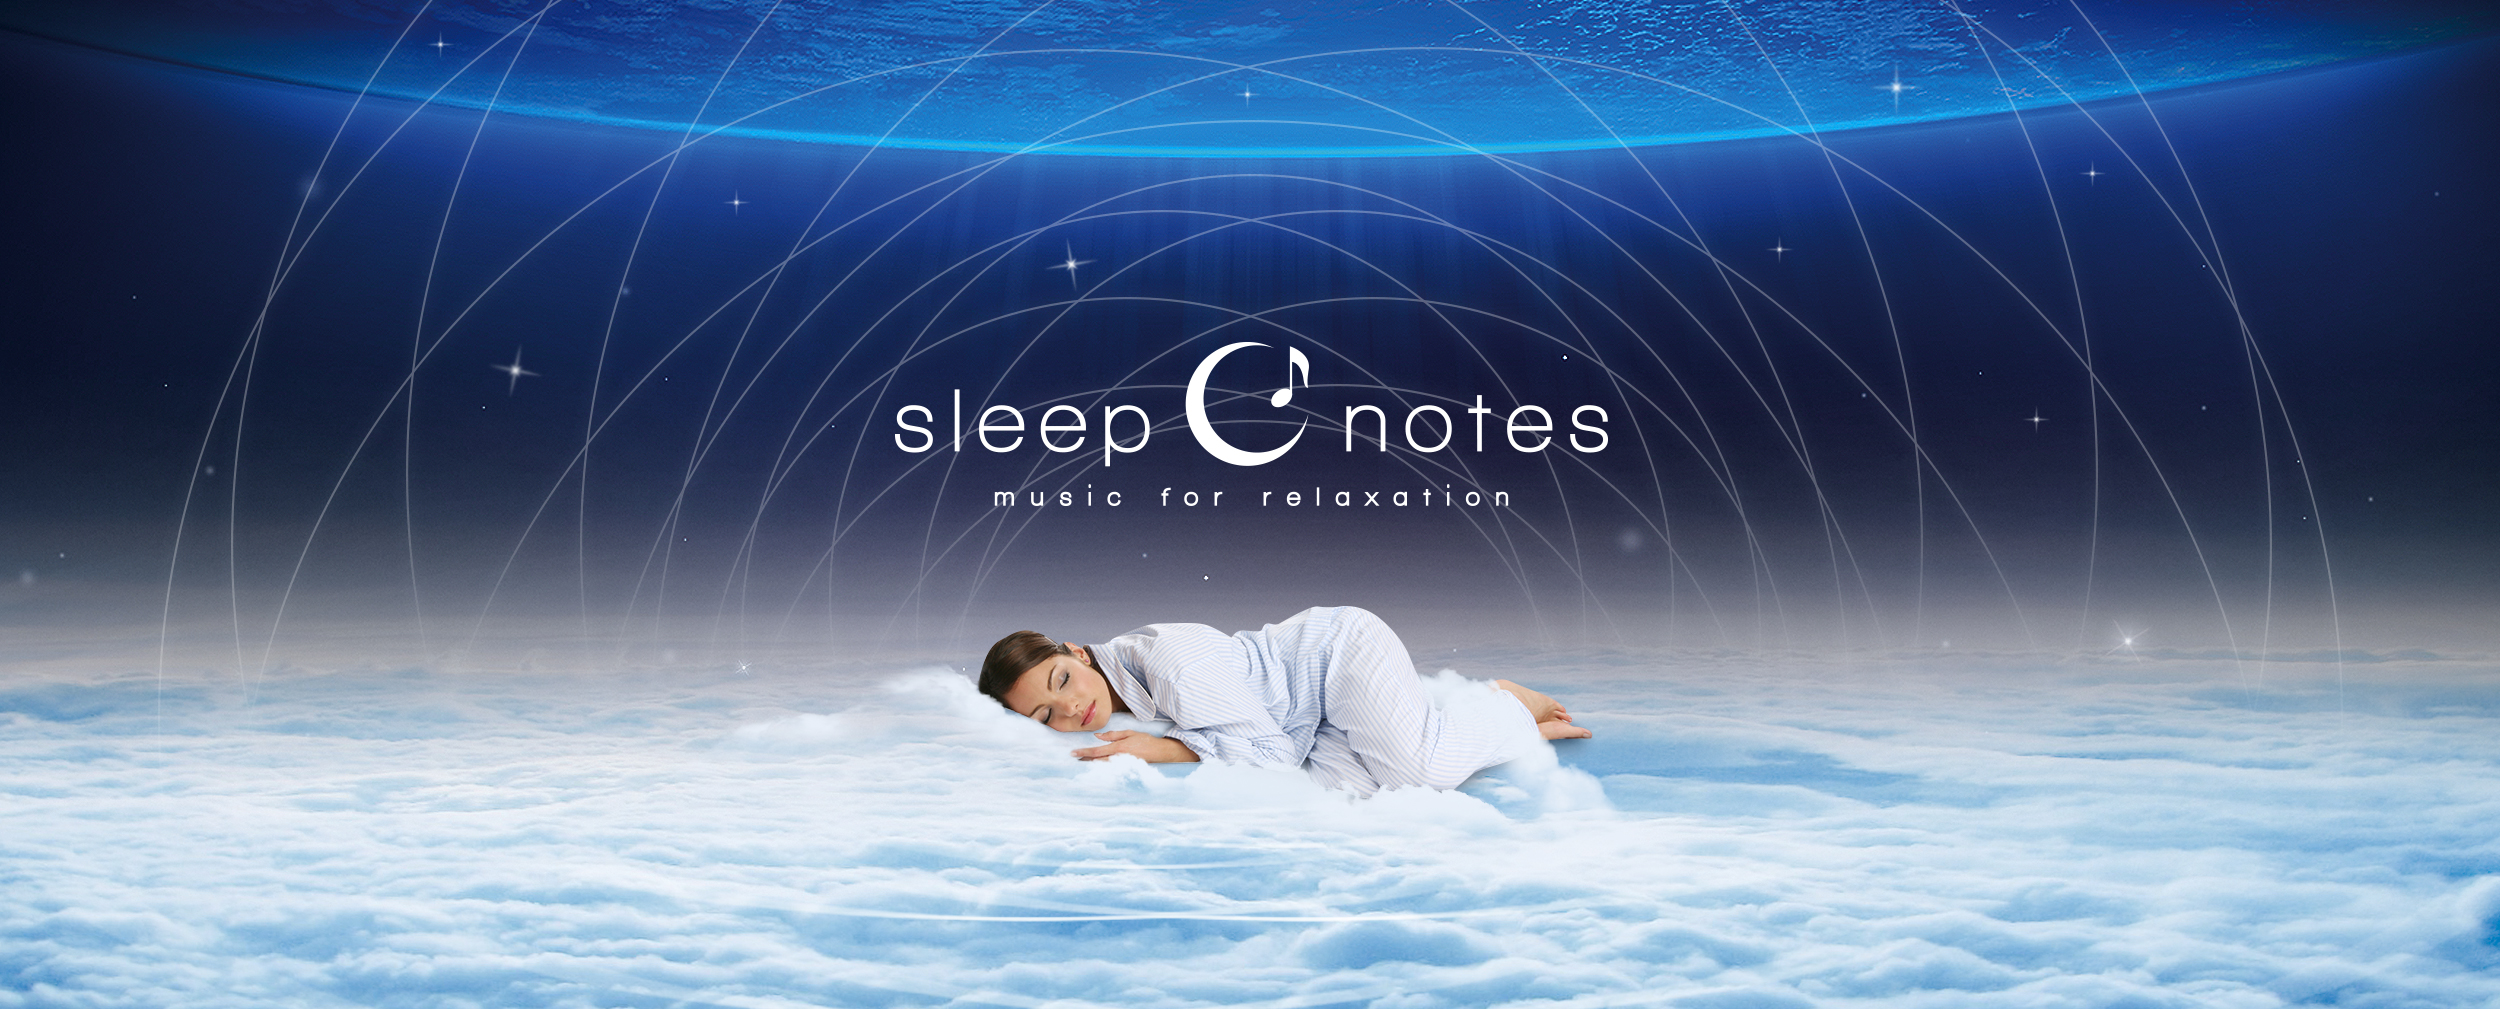 sleepnotes_header